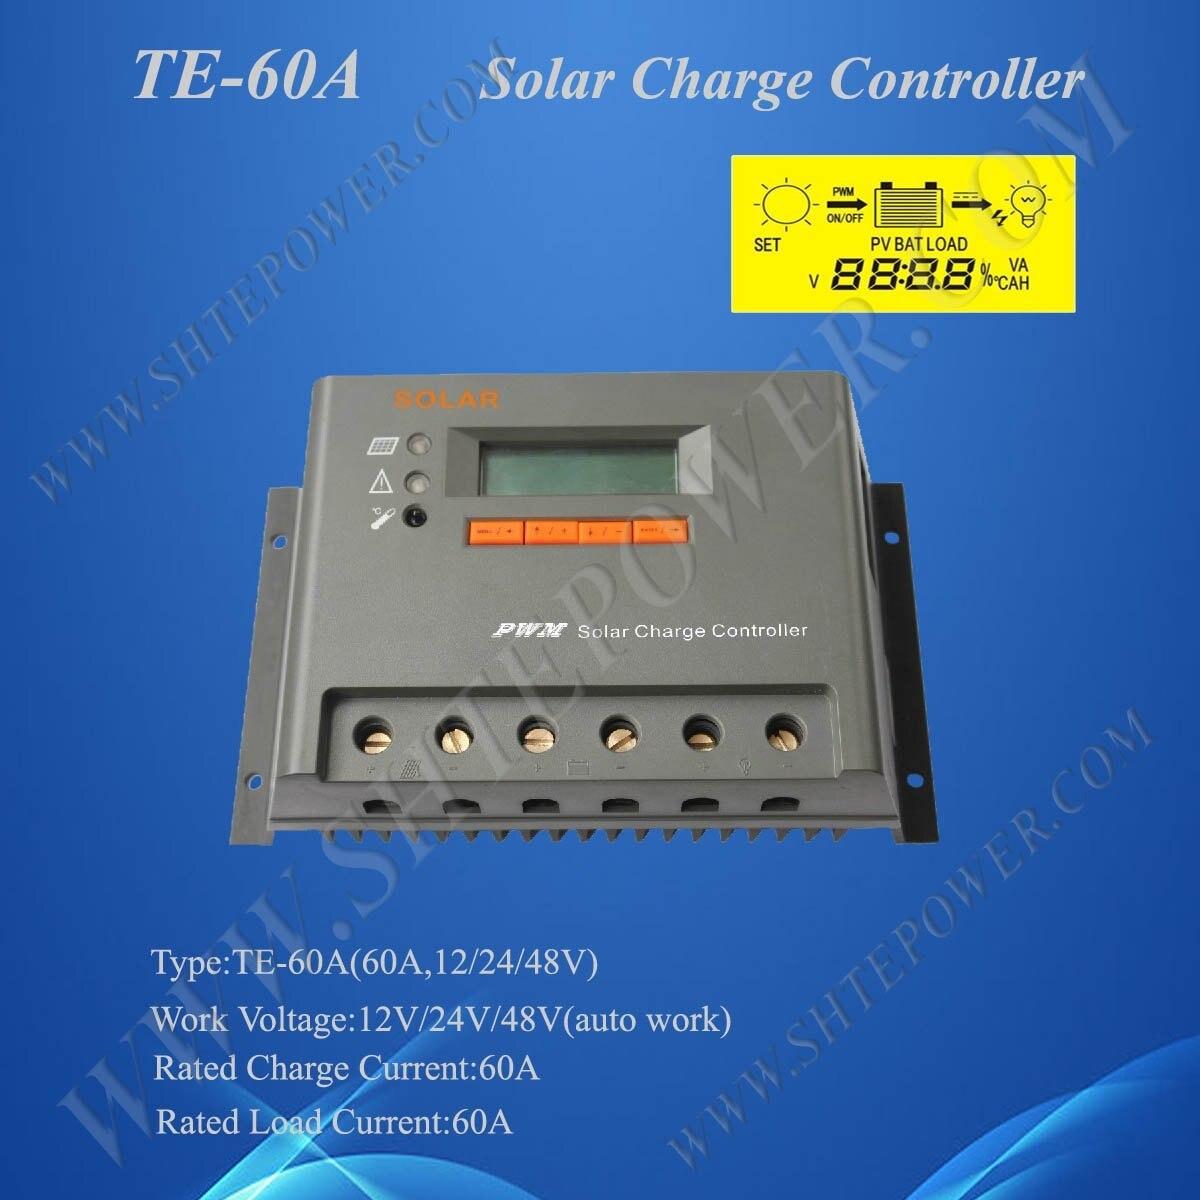 12 В 24 В 48 В Авто Работа Панели солнечные регулятор 60a, гарантия 2 года